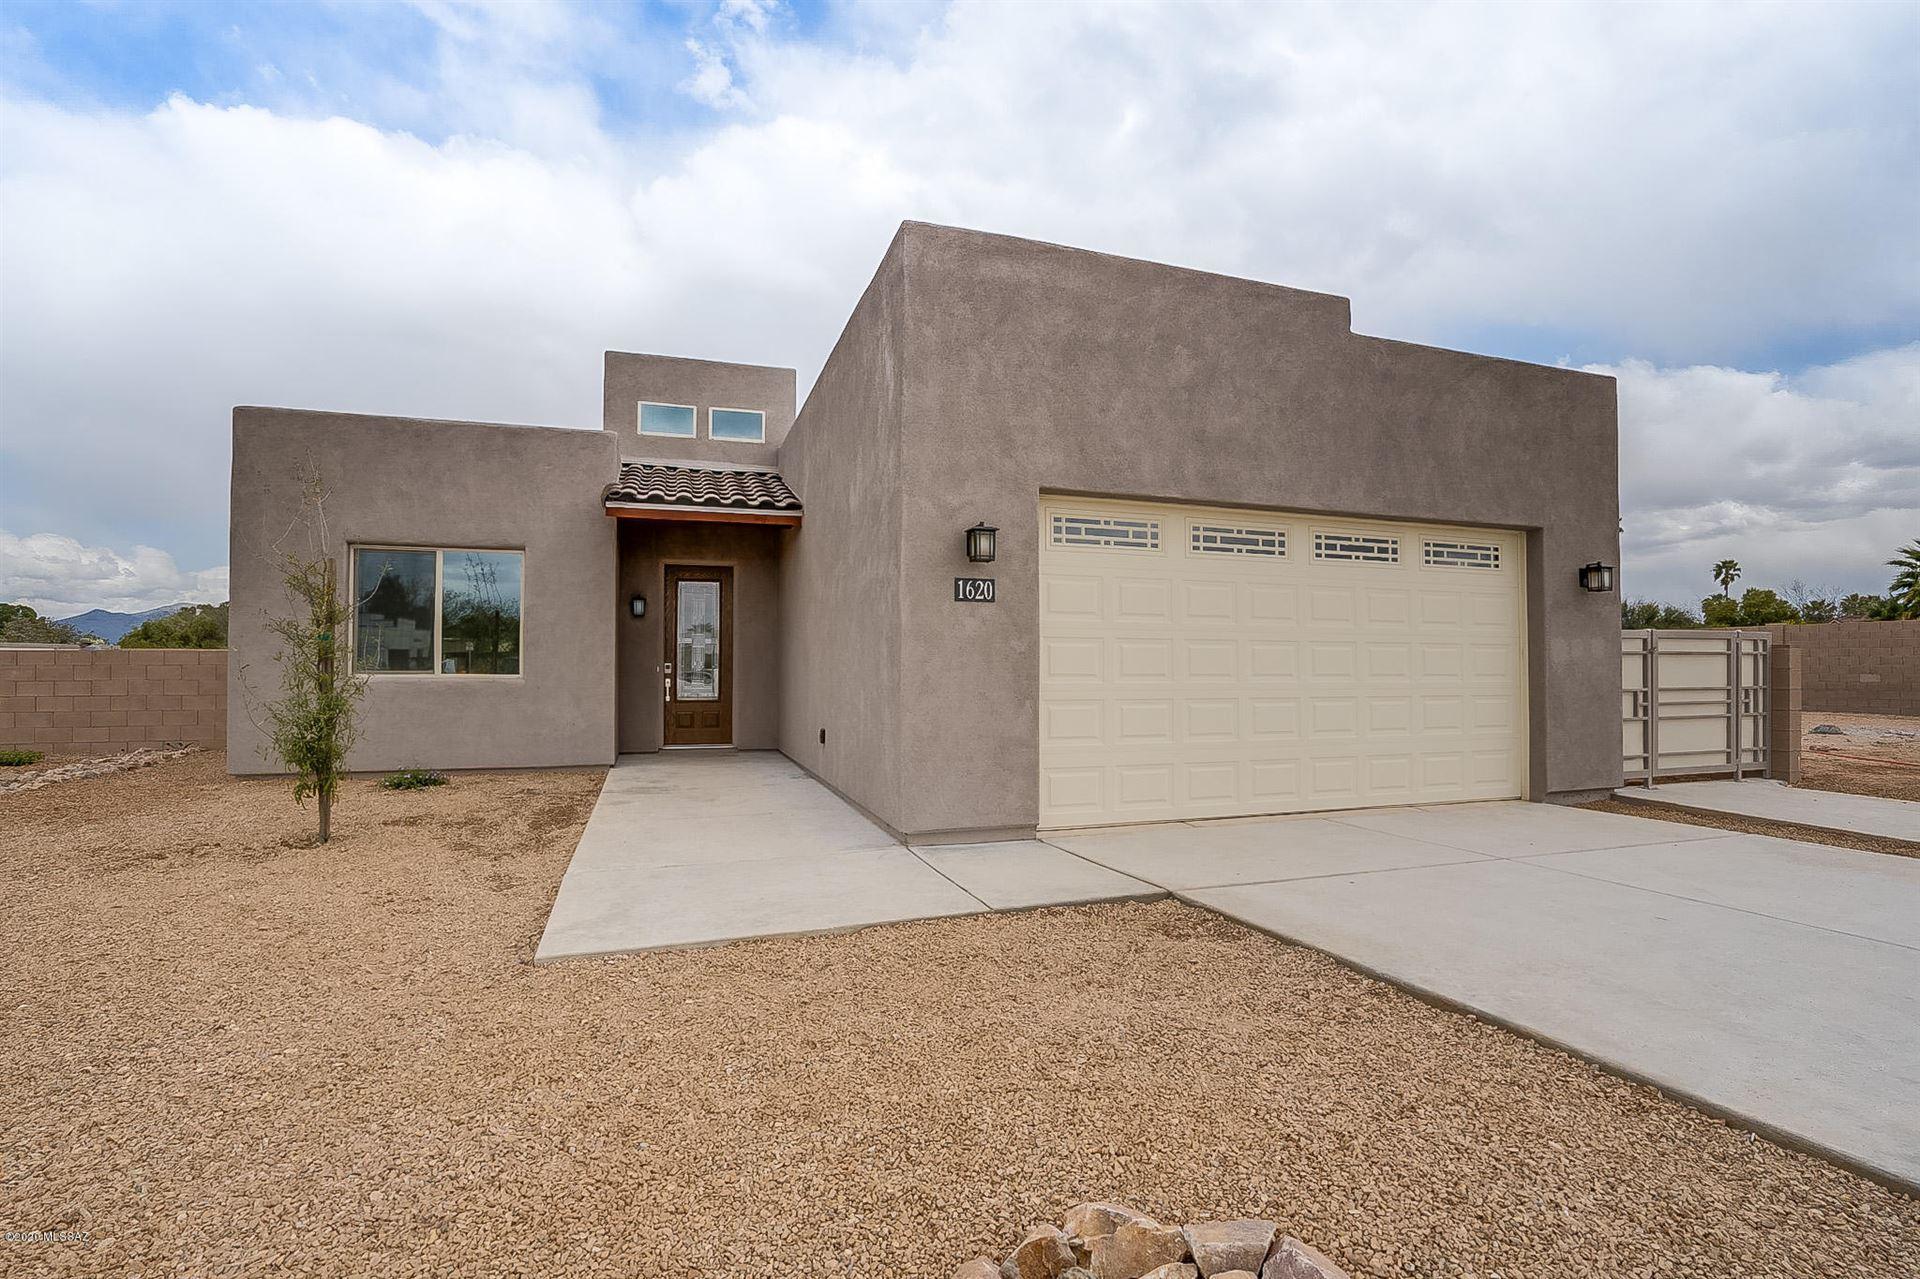 1620 N Jackie Ranch N Place, Tucson, AZ 85715 - MLS#: 22008774